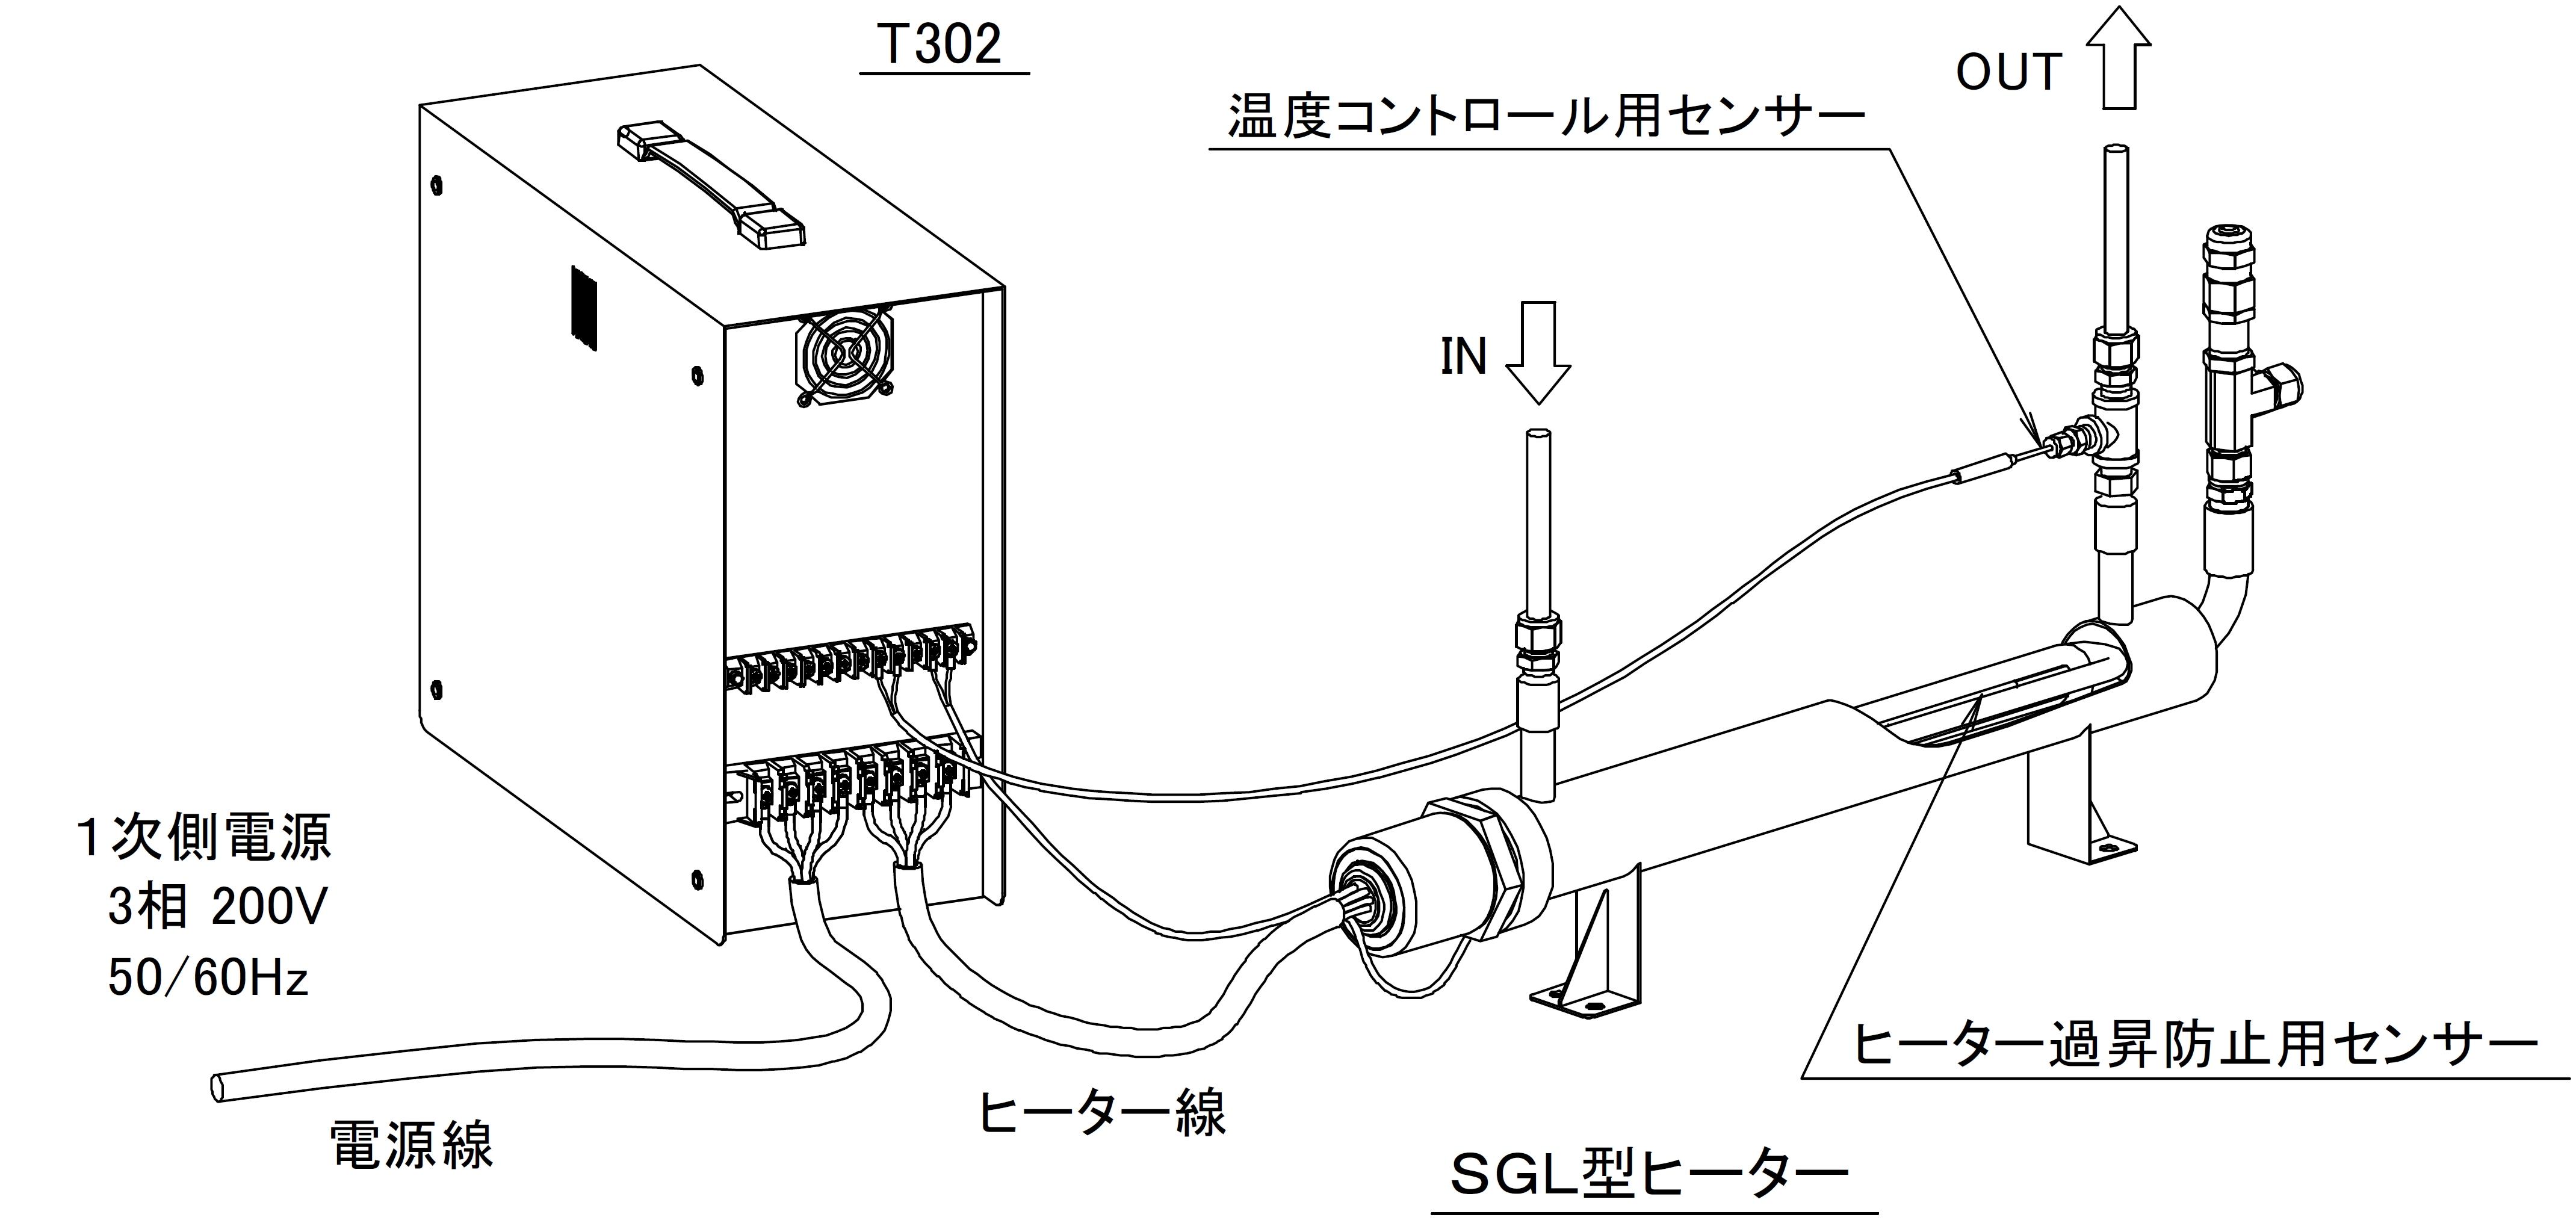 T302結線接続例